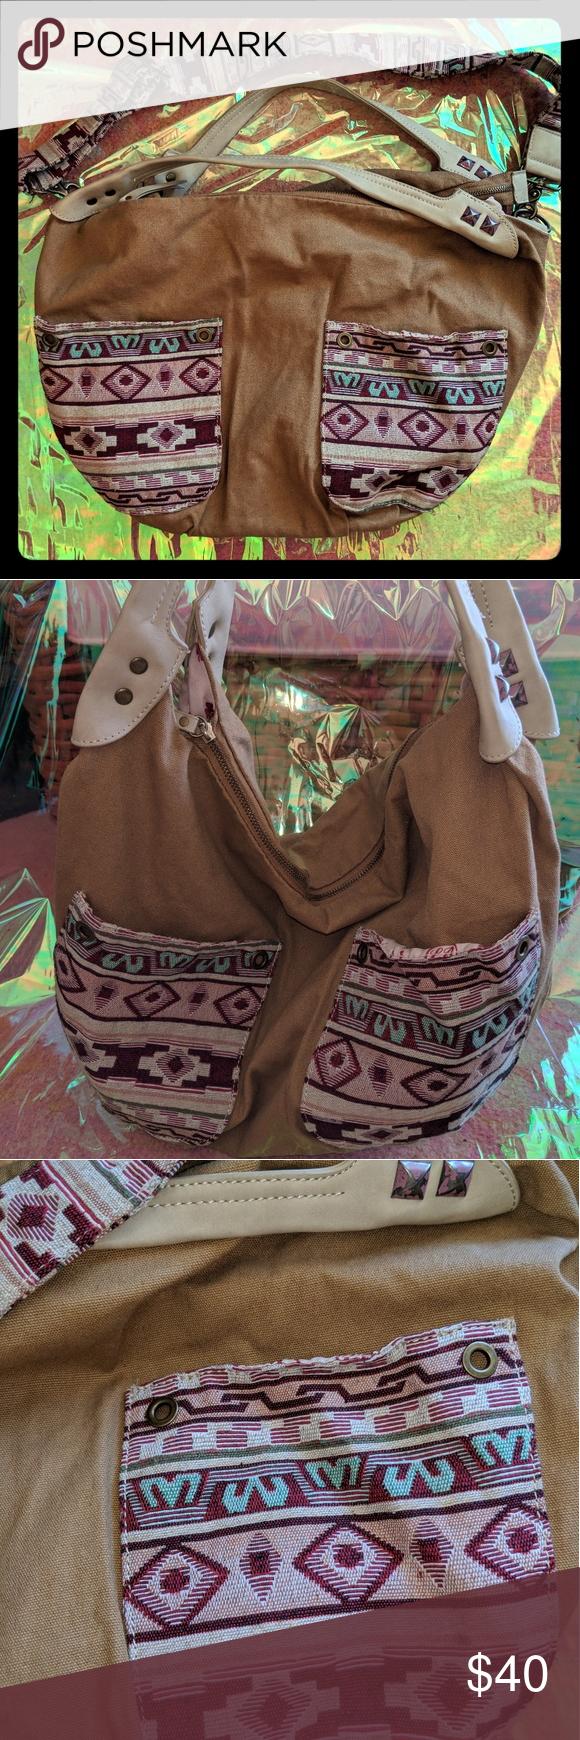 Lucky Brand messenger hobo bag bohemian Aztec Lucky Brand slouchy hobo bag  in kakhi canvas with b94bfa2891